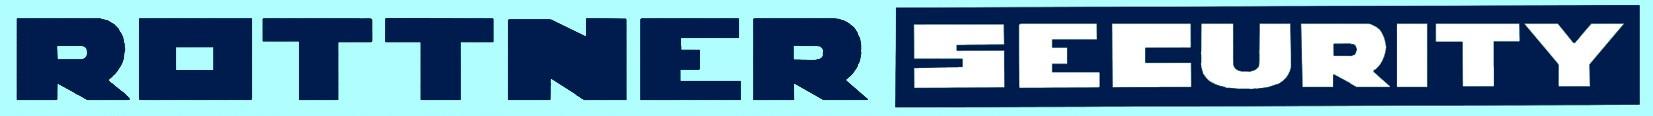 Logo RottnerSecurity Blautöne Nebeneinander